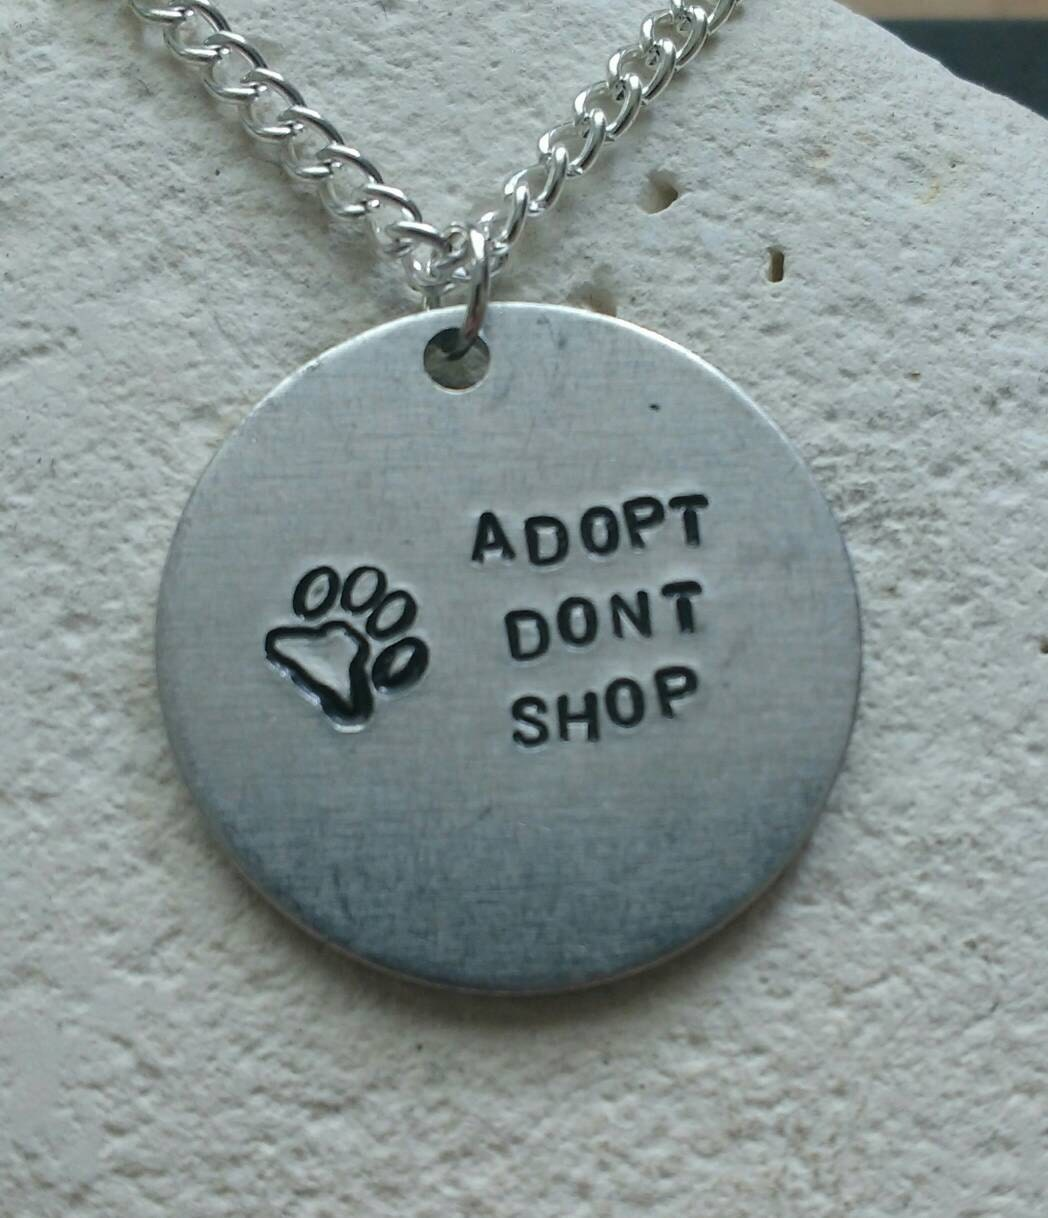 Adopt dont shop animal adoption necklace - Vegan message necklace - vegan jewellery - jewelry - animal rights jewellery - handstamped